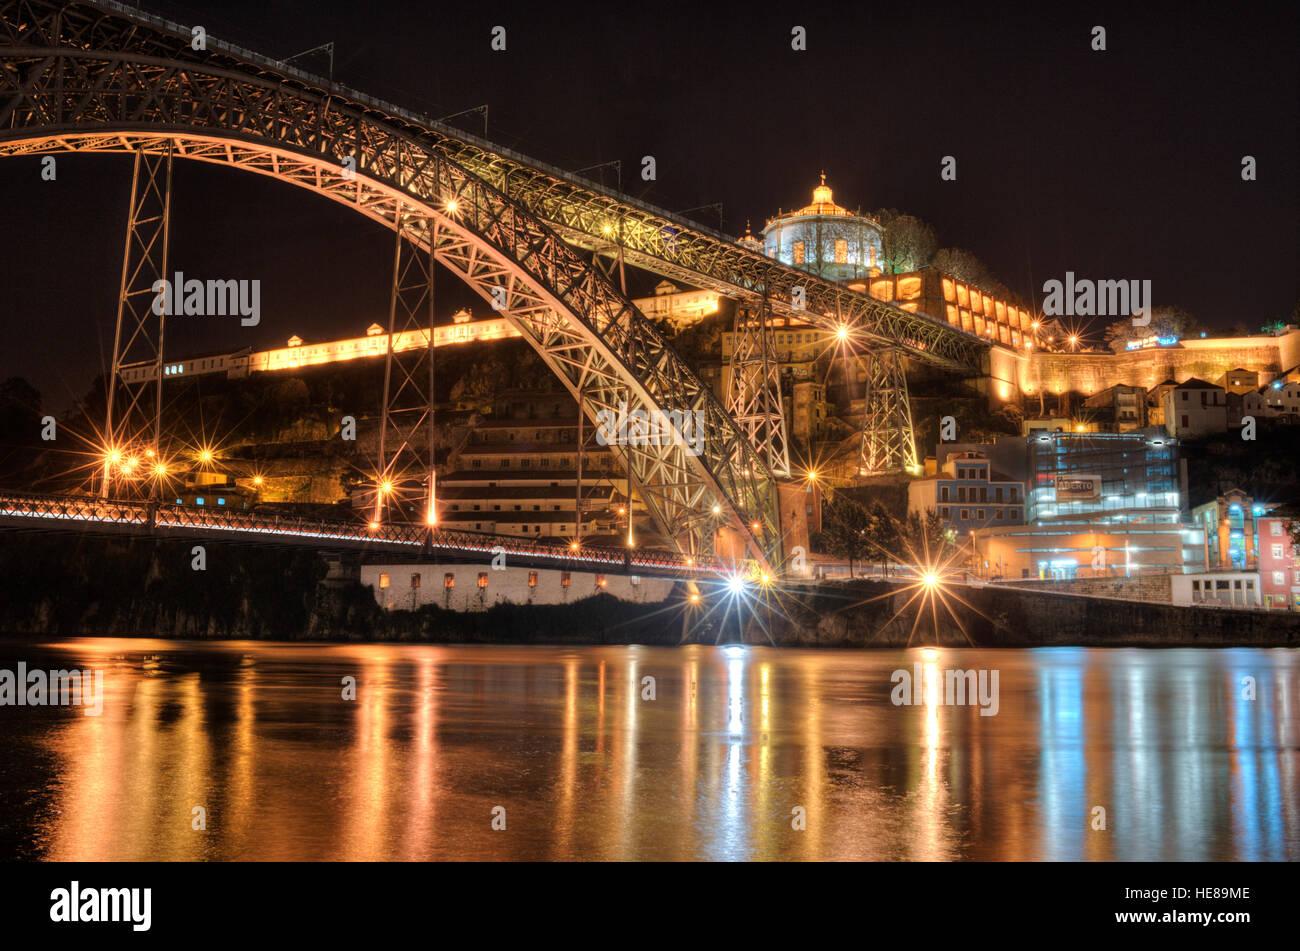 Ponte Dom Luís I, doppelte decked Metall Bogen Brücke überspannt den Fluss Douro, 19. Jahrhundert, Stockbild